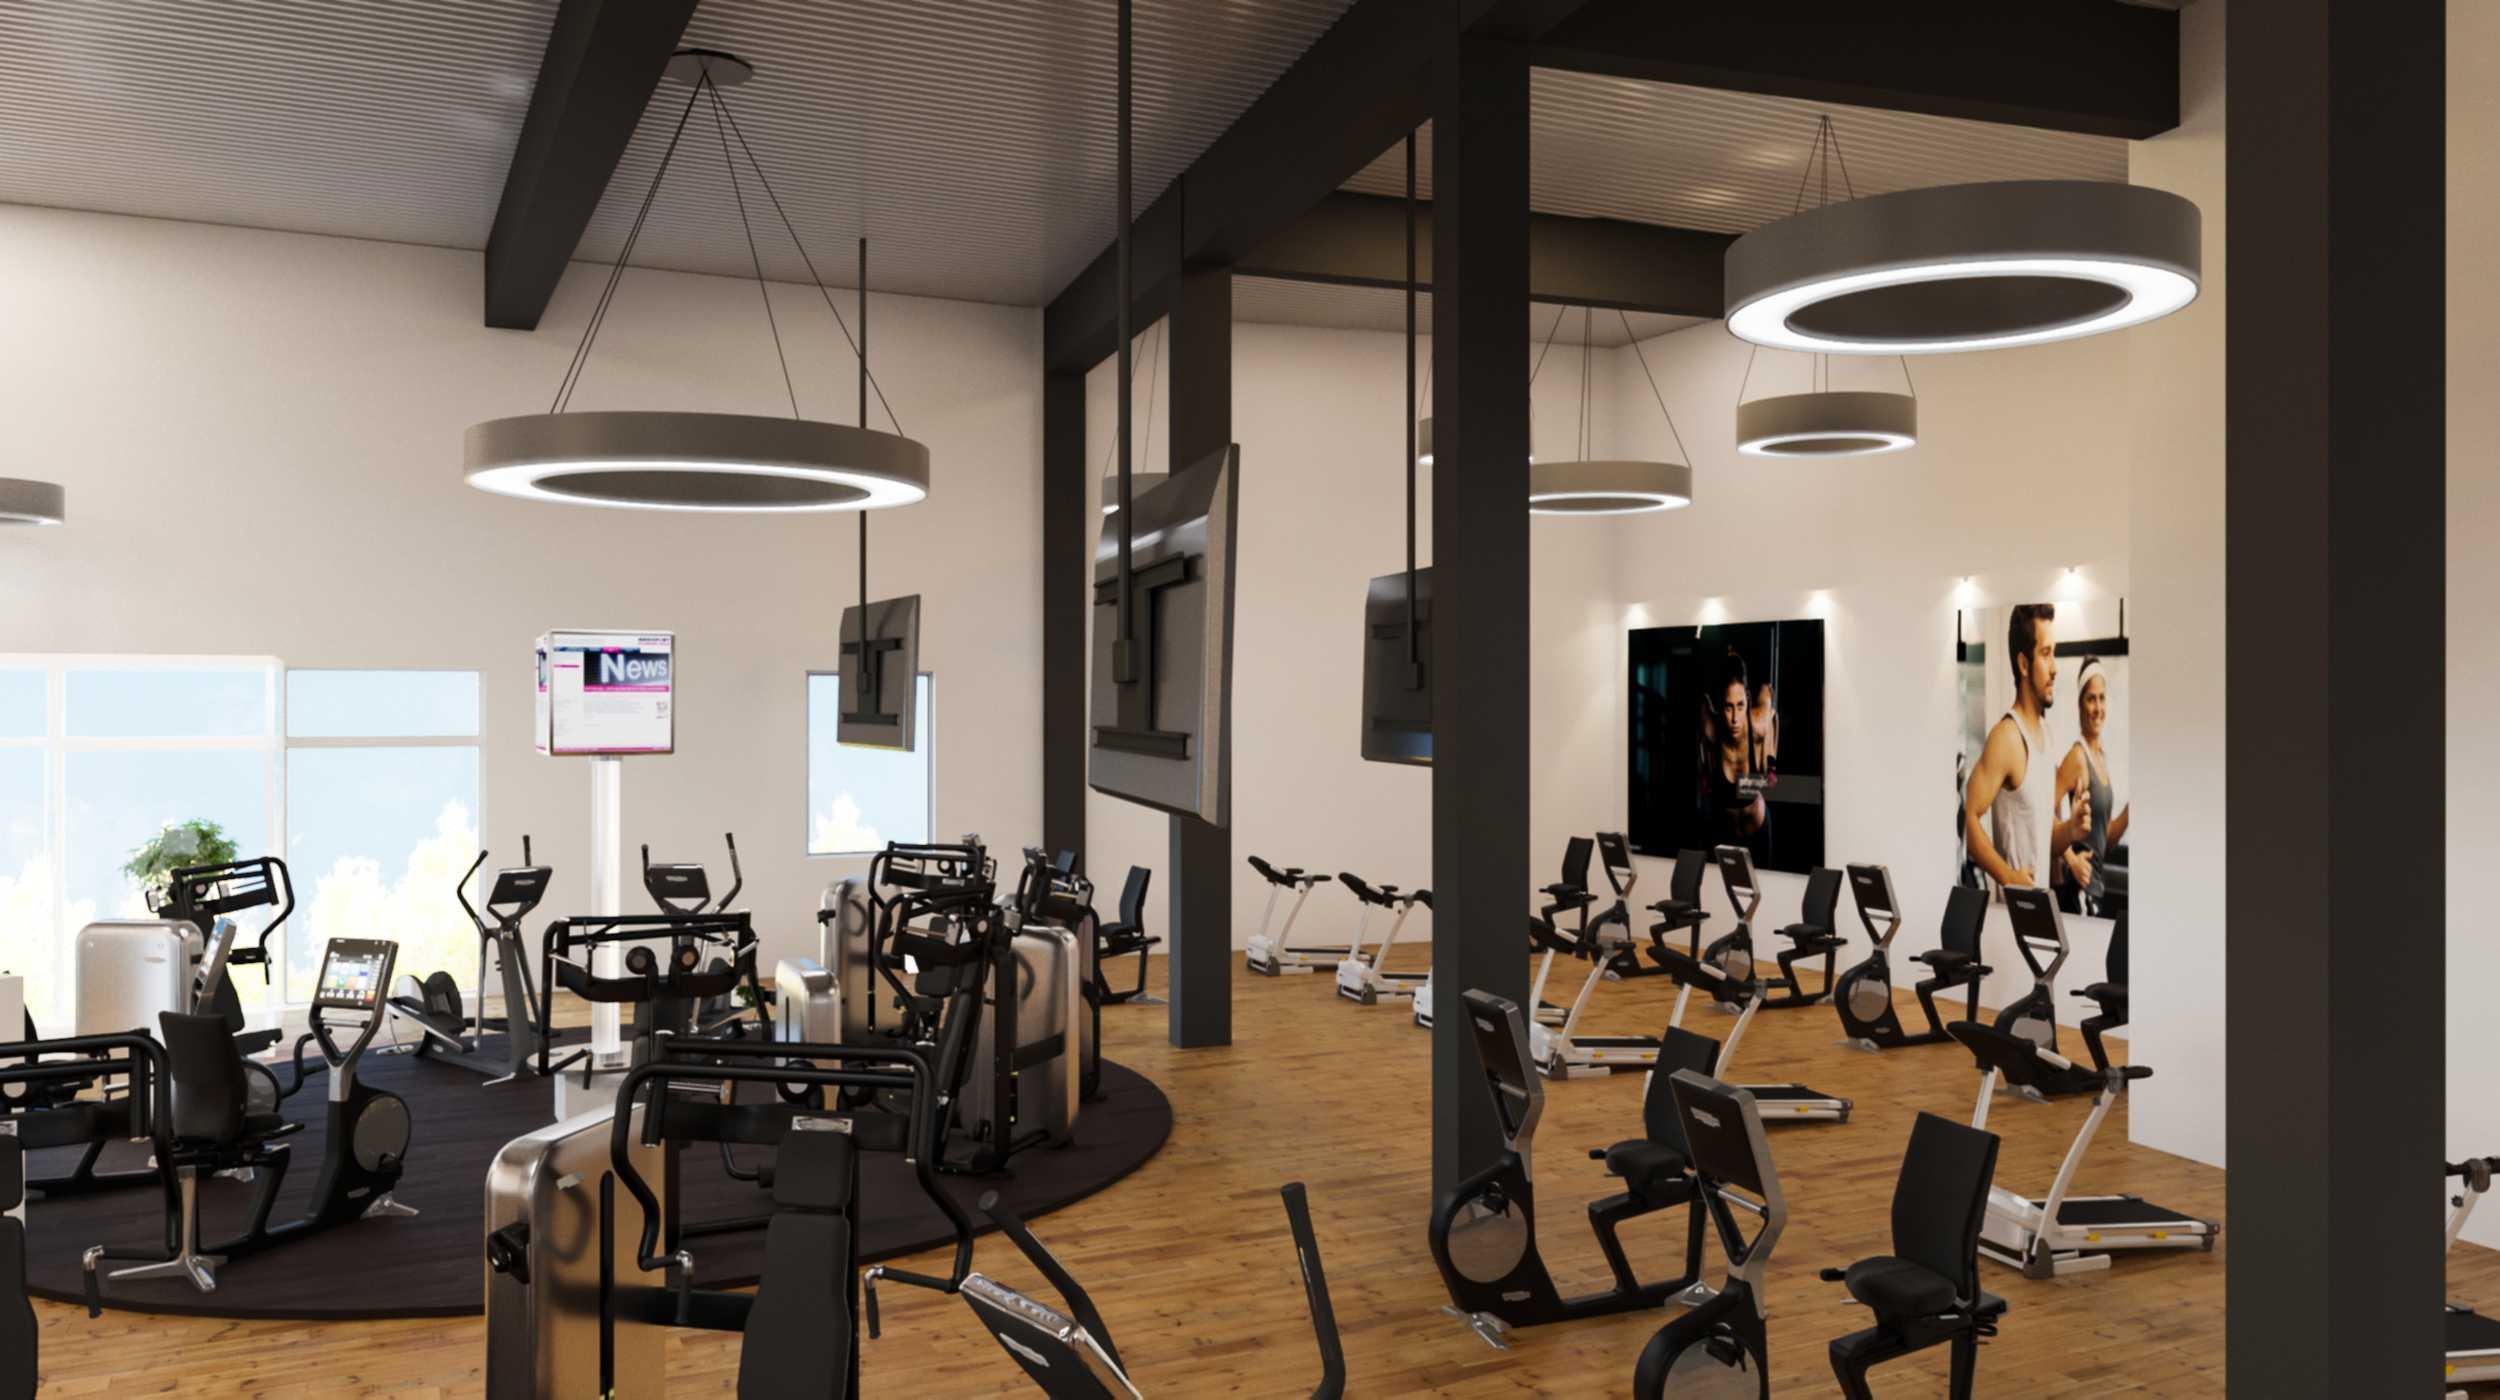 3d visualisierung fitnesscenter 4693 v2 v5 architektur und immobilien visualisierung. Black Bedroom Furniture Sets. Home Design Ideas